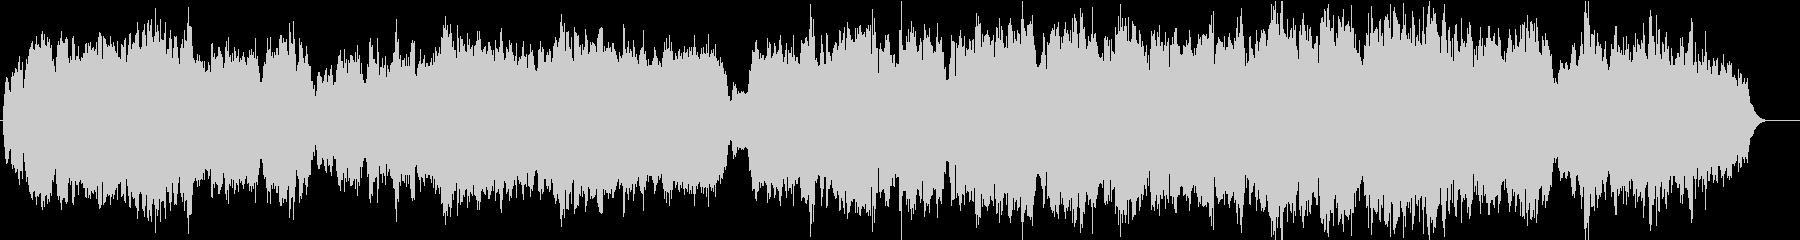 [Live Recording] Inspiring Horn&Strings's unreproduced waveform